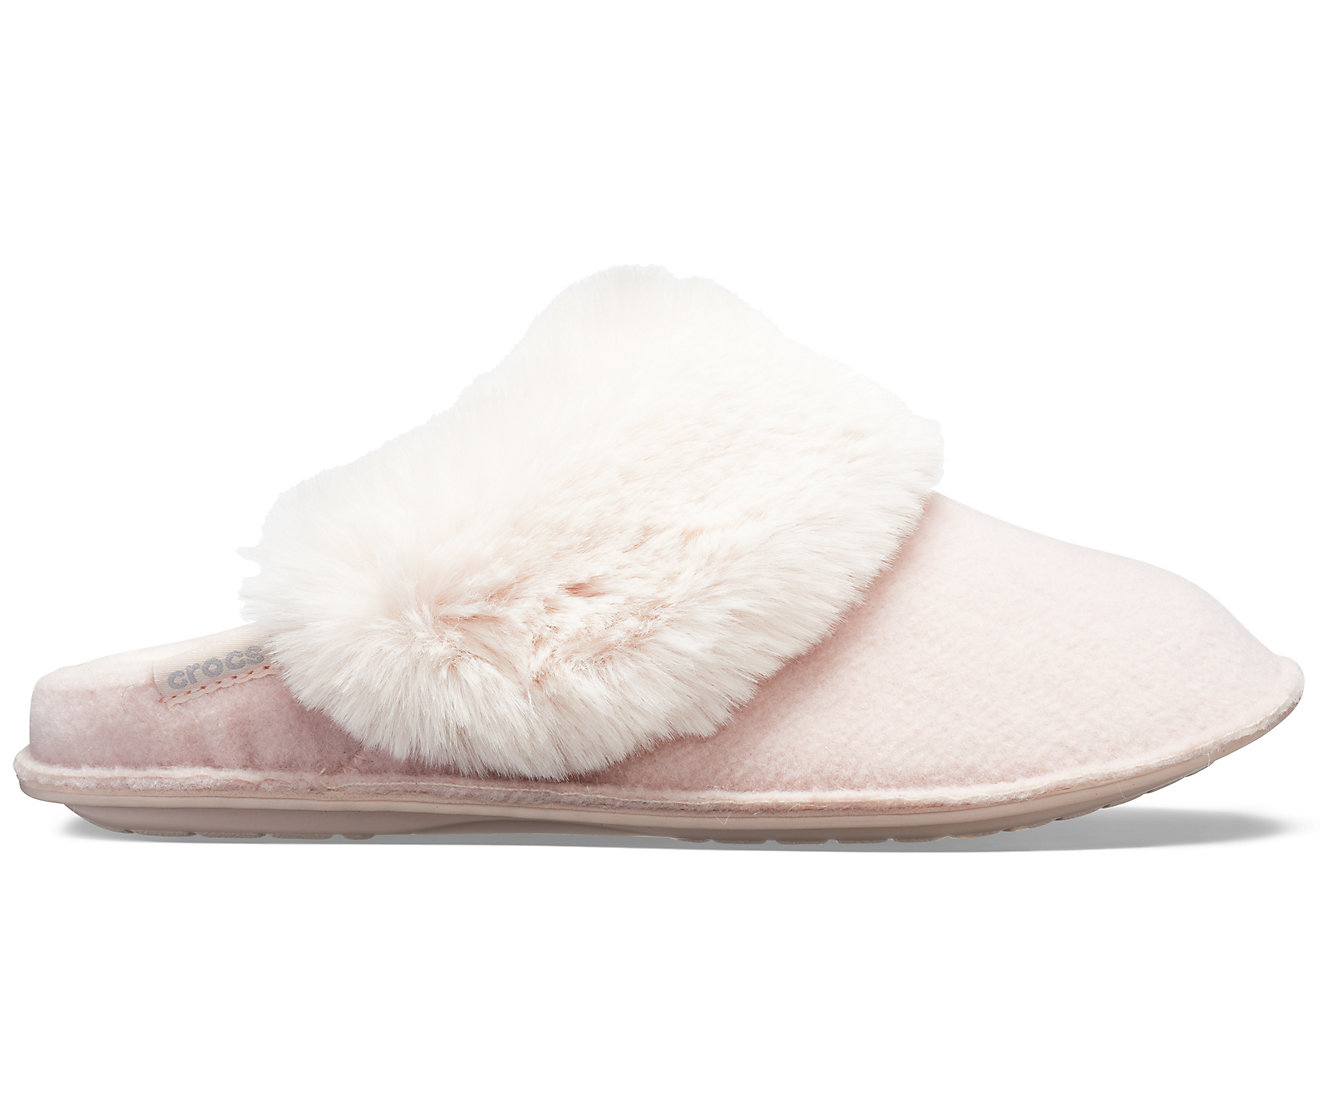 f3005e6b8b Crocs púdrové papuče na doma Classic Luxe Slipper Rose Dust - Glami.sk